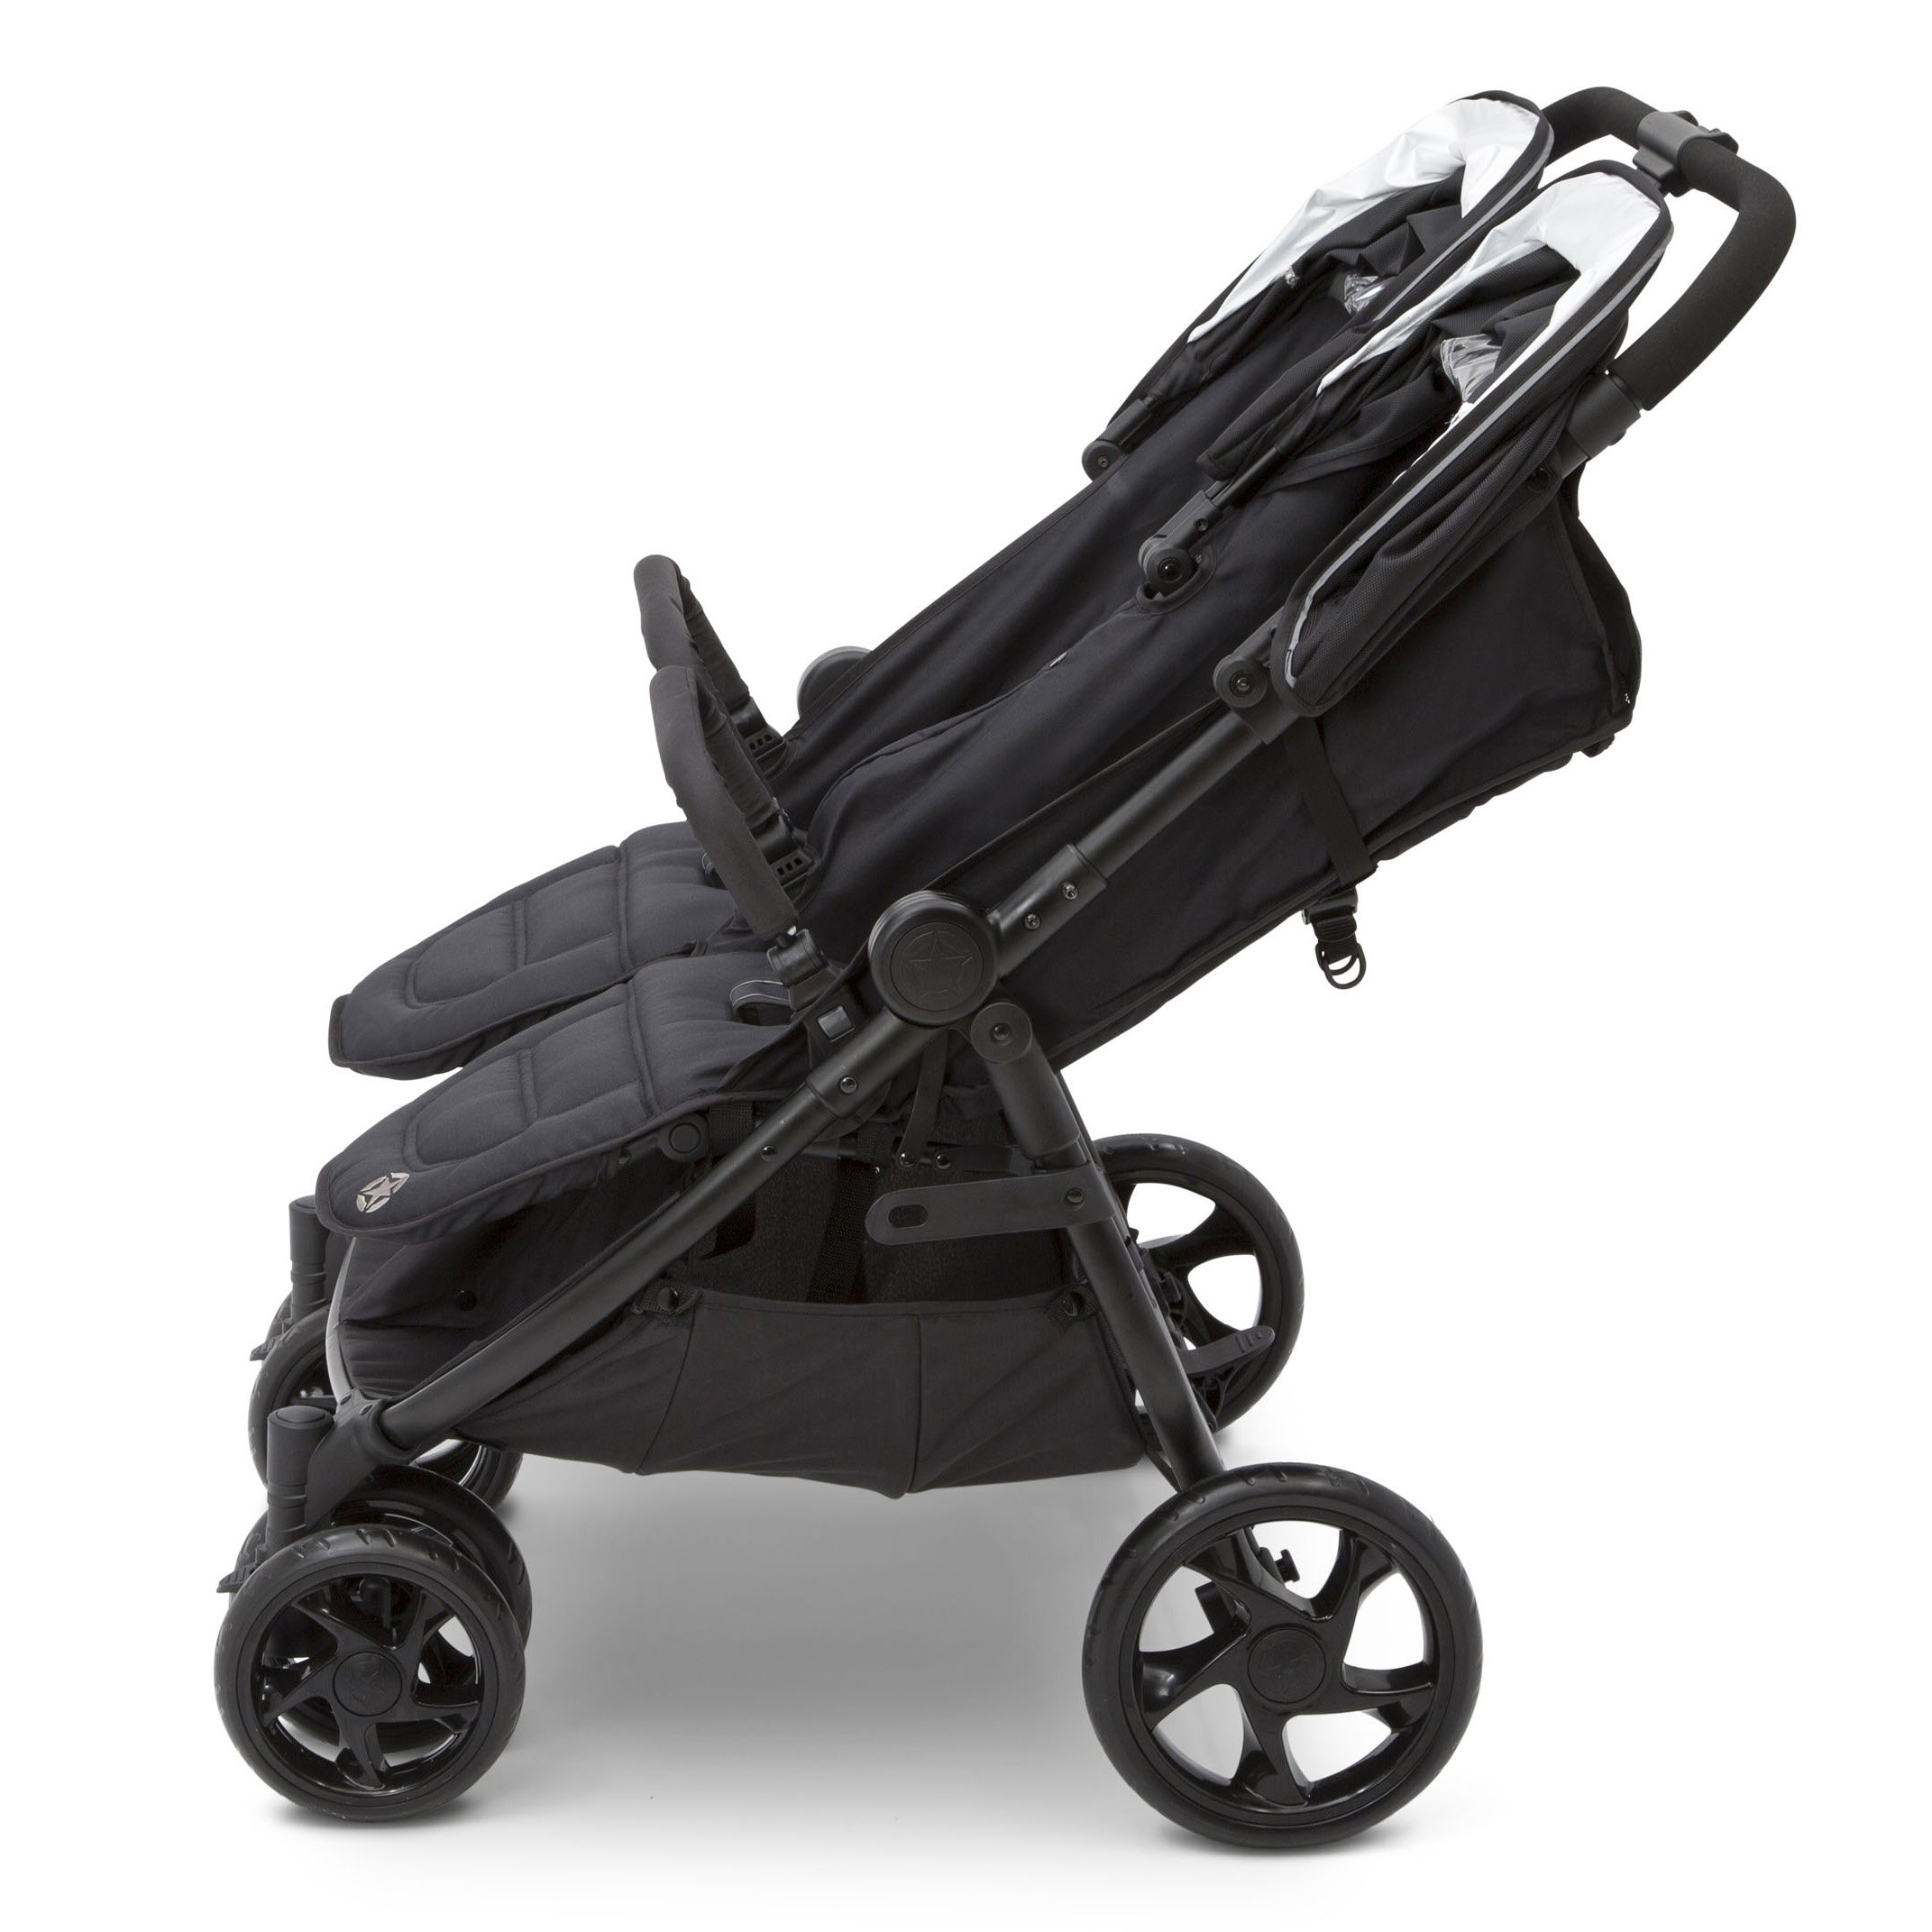 Jeep Destination Ultralight Side x Side Double Stroller, Midnight (Black) by Delta Children (Image #5)